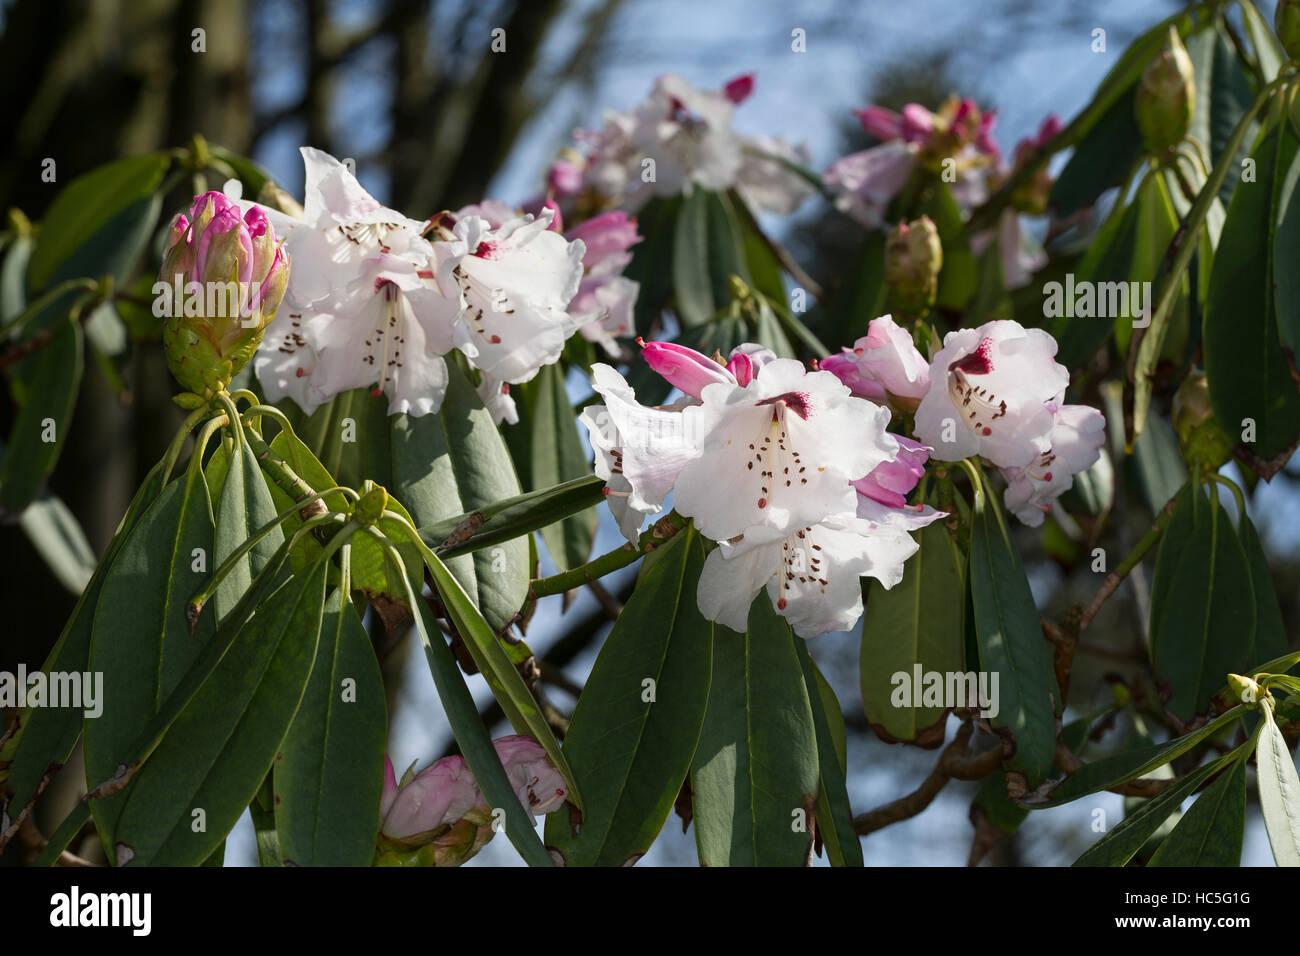 Rhododendron, Sichuan-Rhododendron, Rhododendron sutchuenense, Sichuan Rhododendron - Stock Image